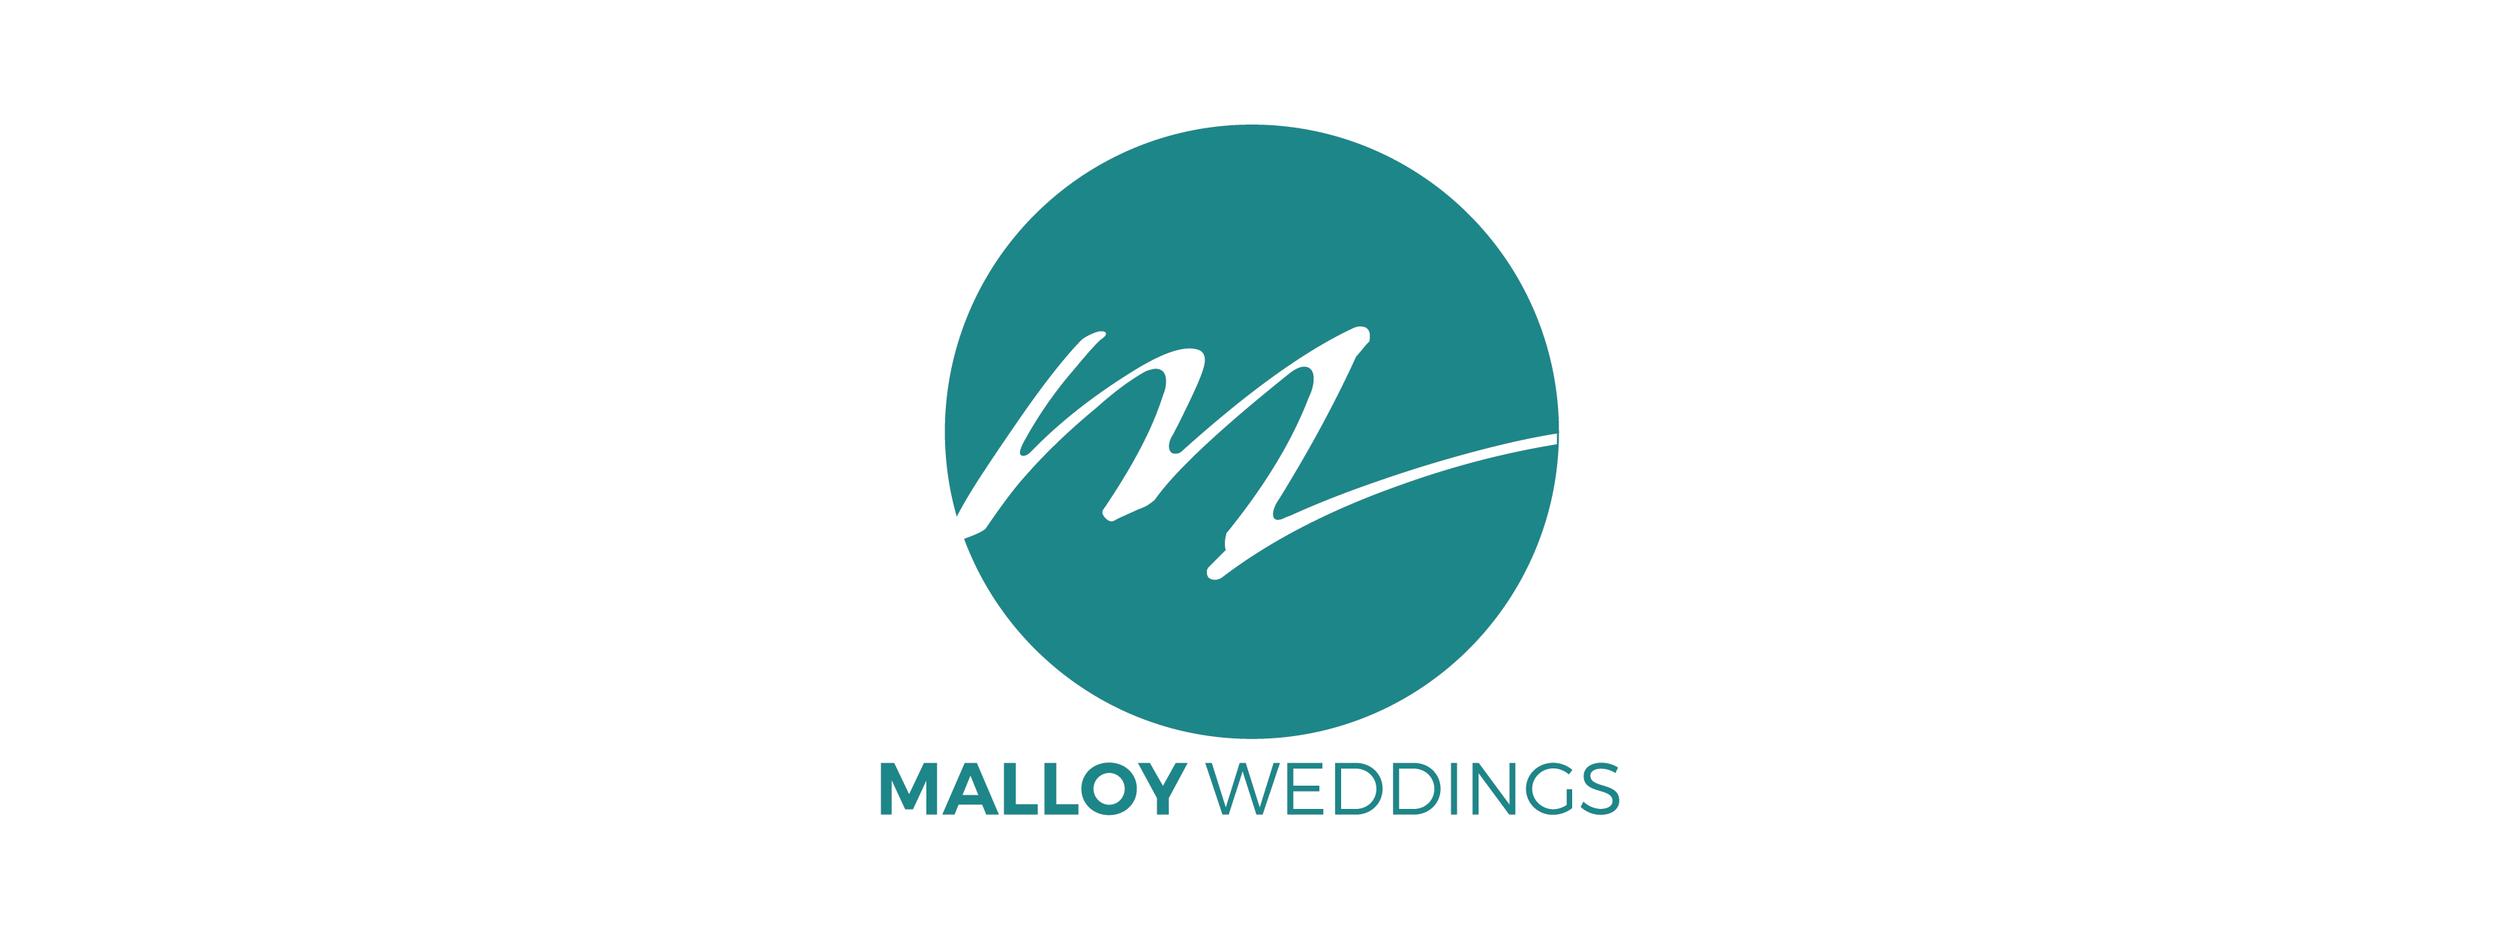 Malloy_Weddings_header.png